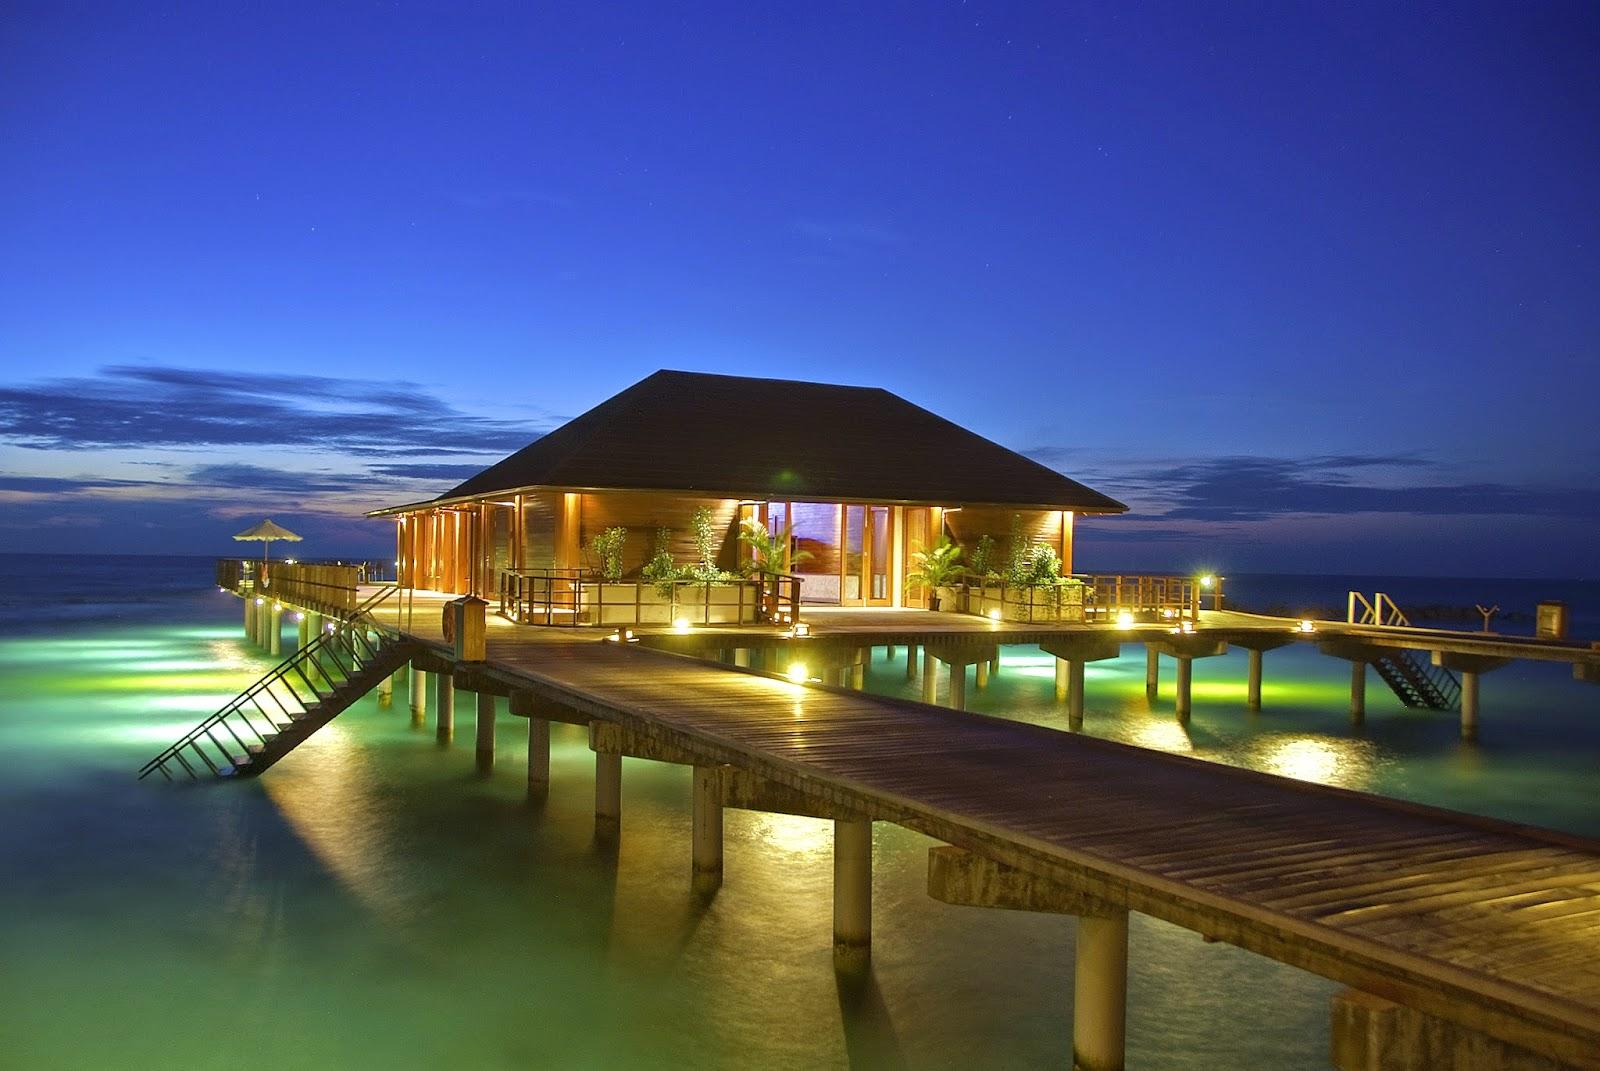 GreyIndecision reviews Paradise Island Resort & Spa Maldives